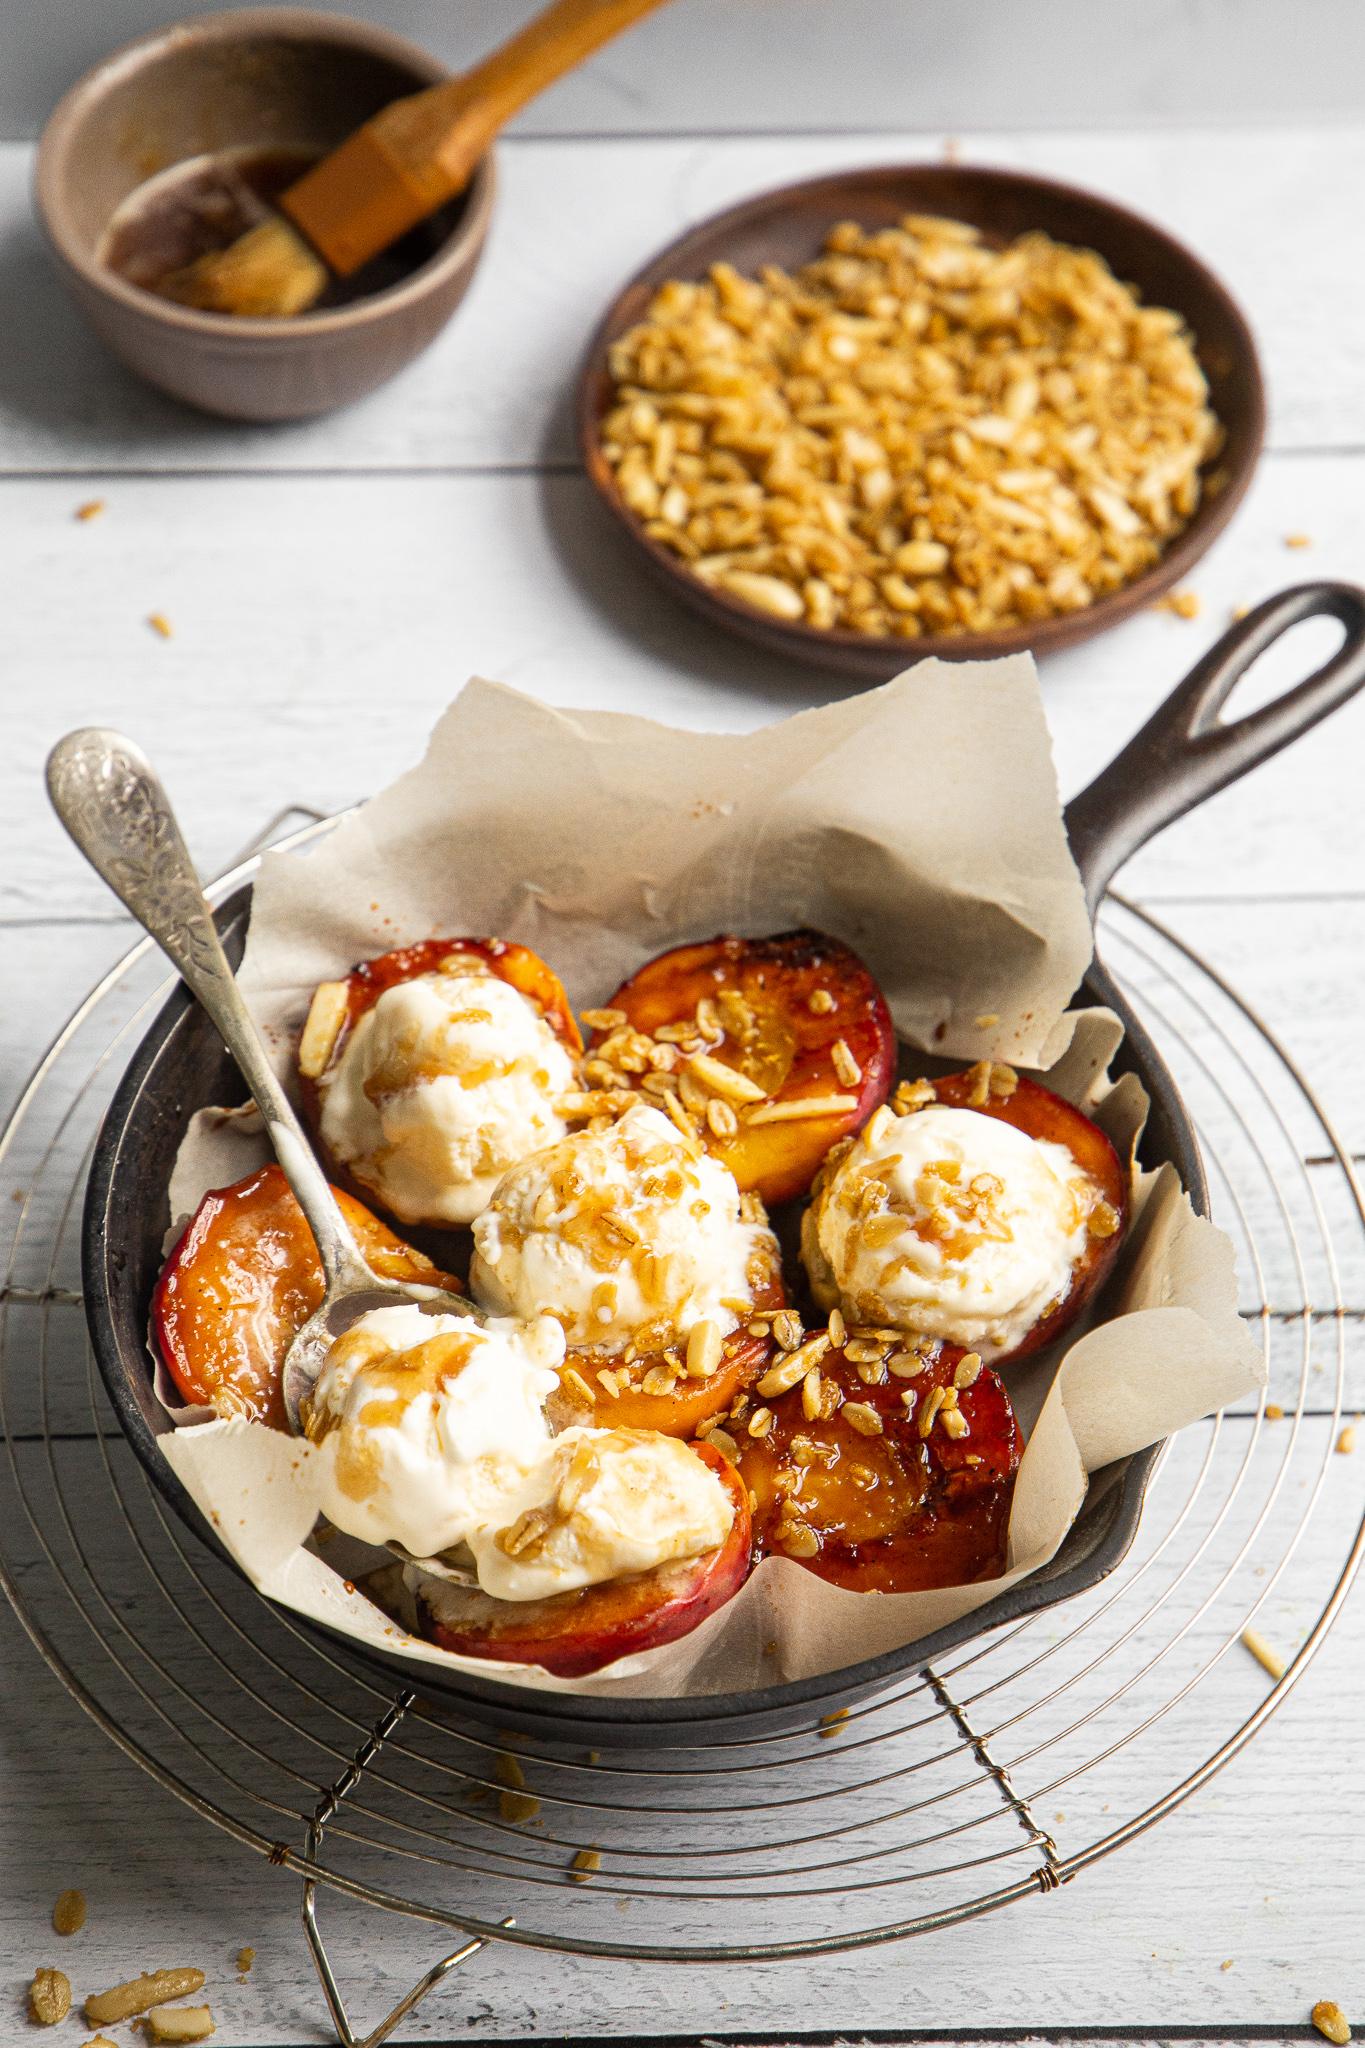 Balsamic and Honey Glazed Peaches - A grown-up, gourmet peach cobbler emerges.